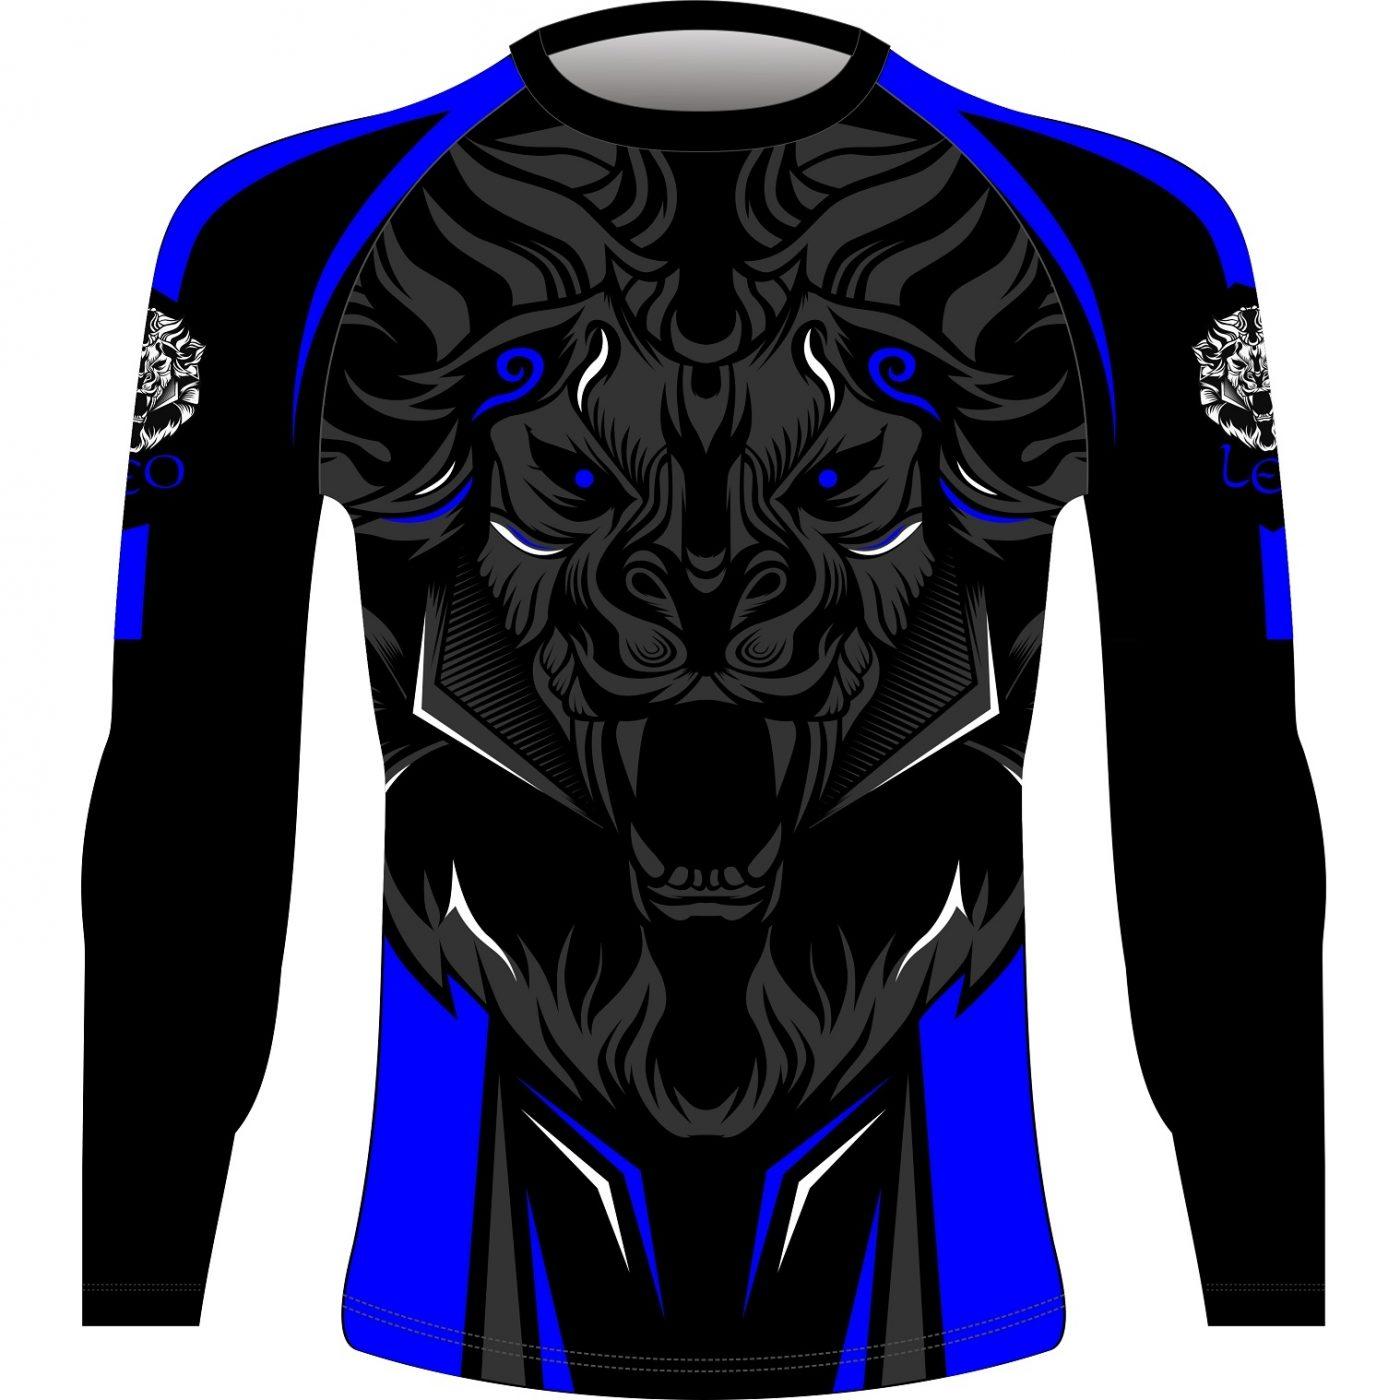 Leo ROAR Rashguard LS - Black/Blue